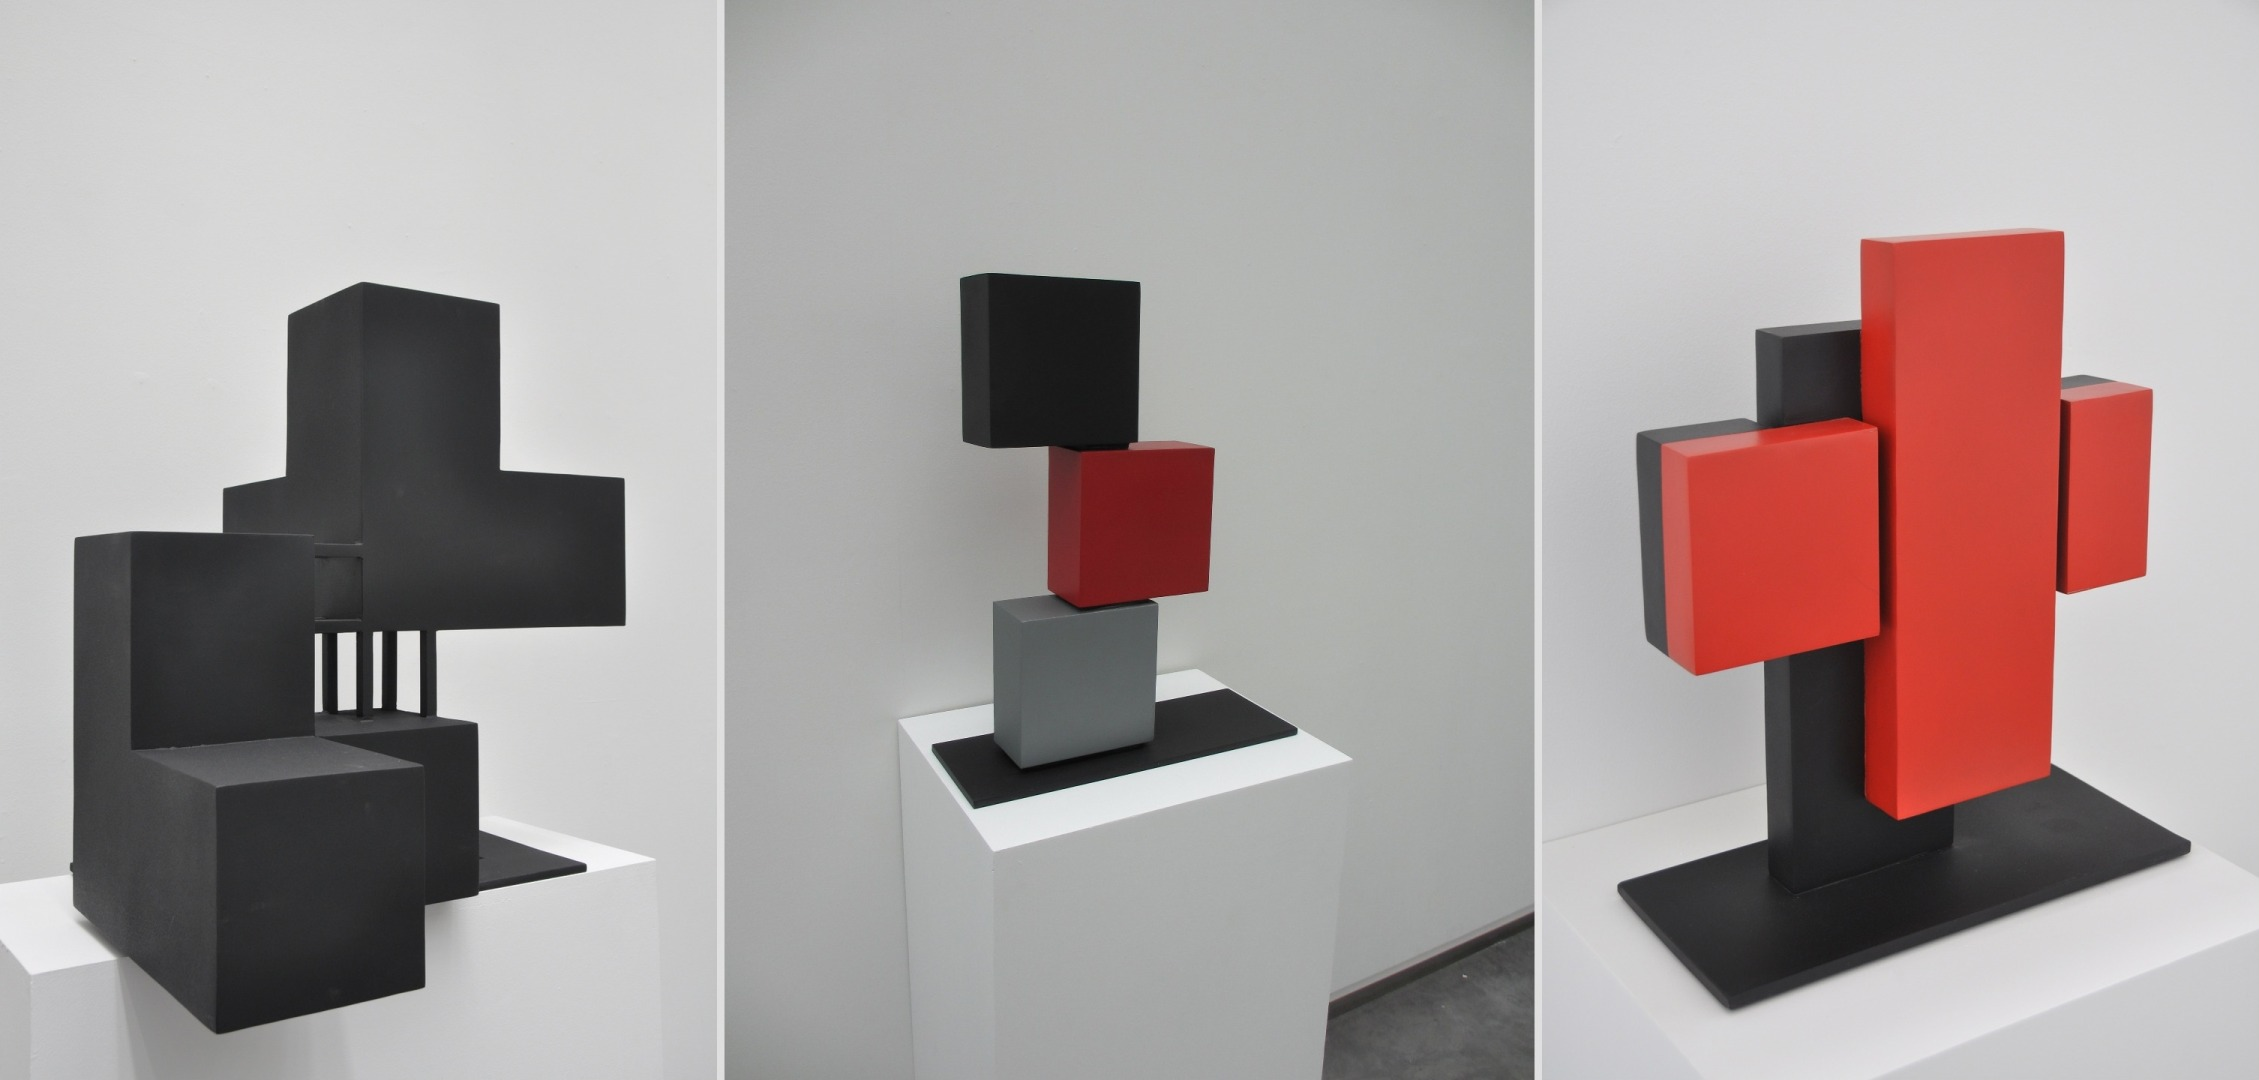 Spanish and Ukrainian Cultures in the Art of Carlos García Lahoz